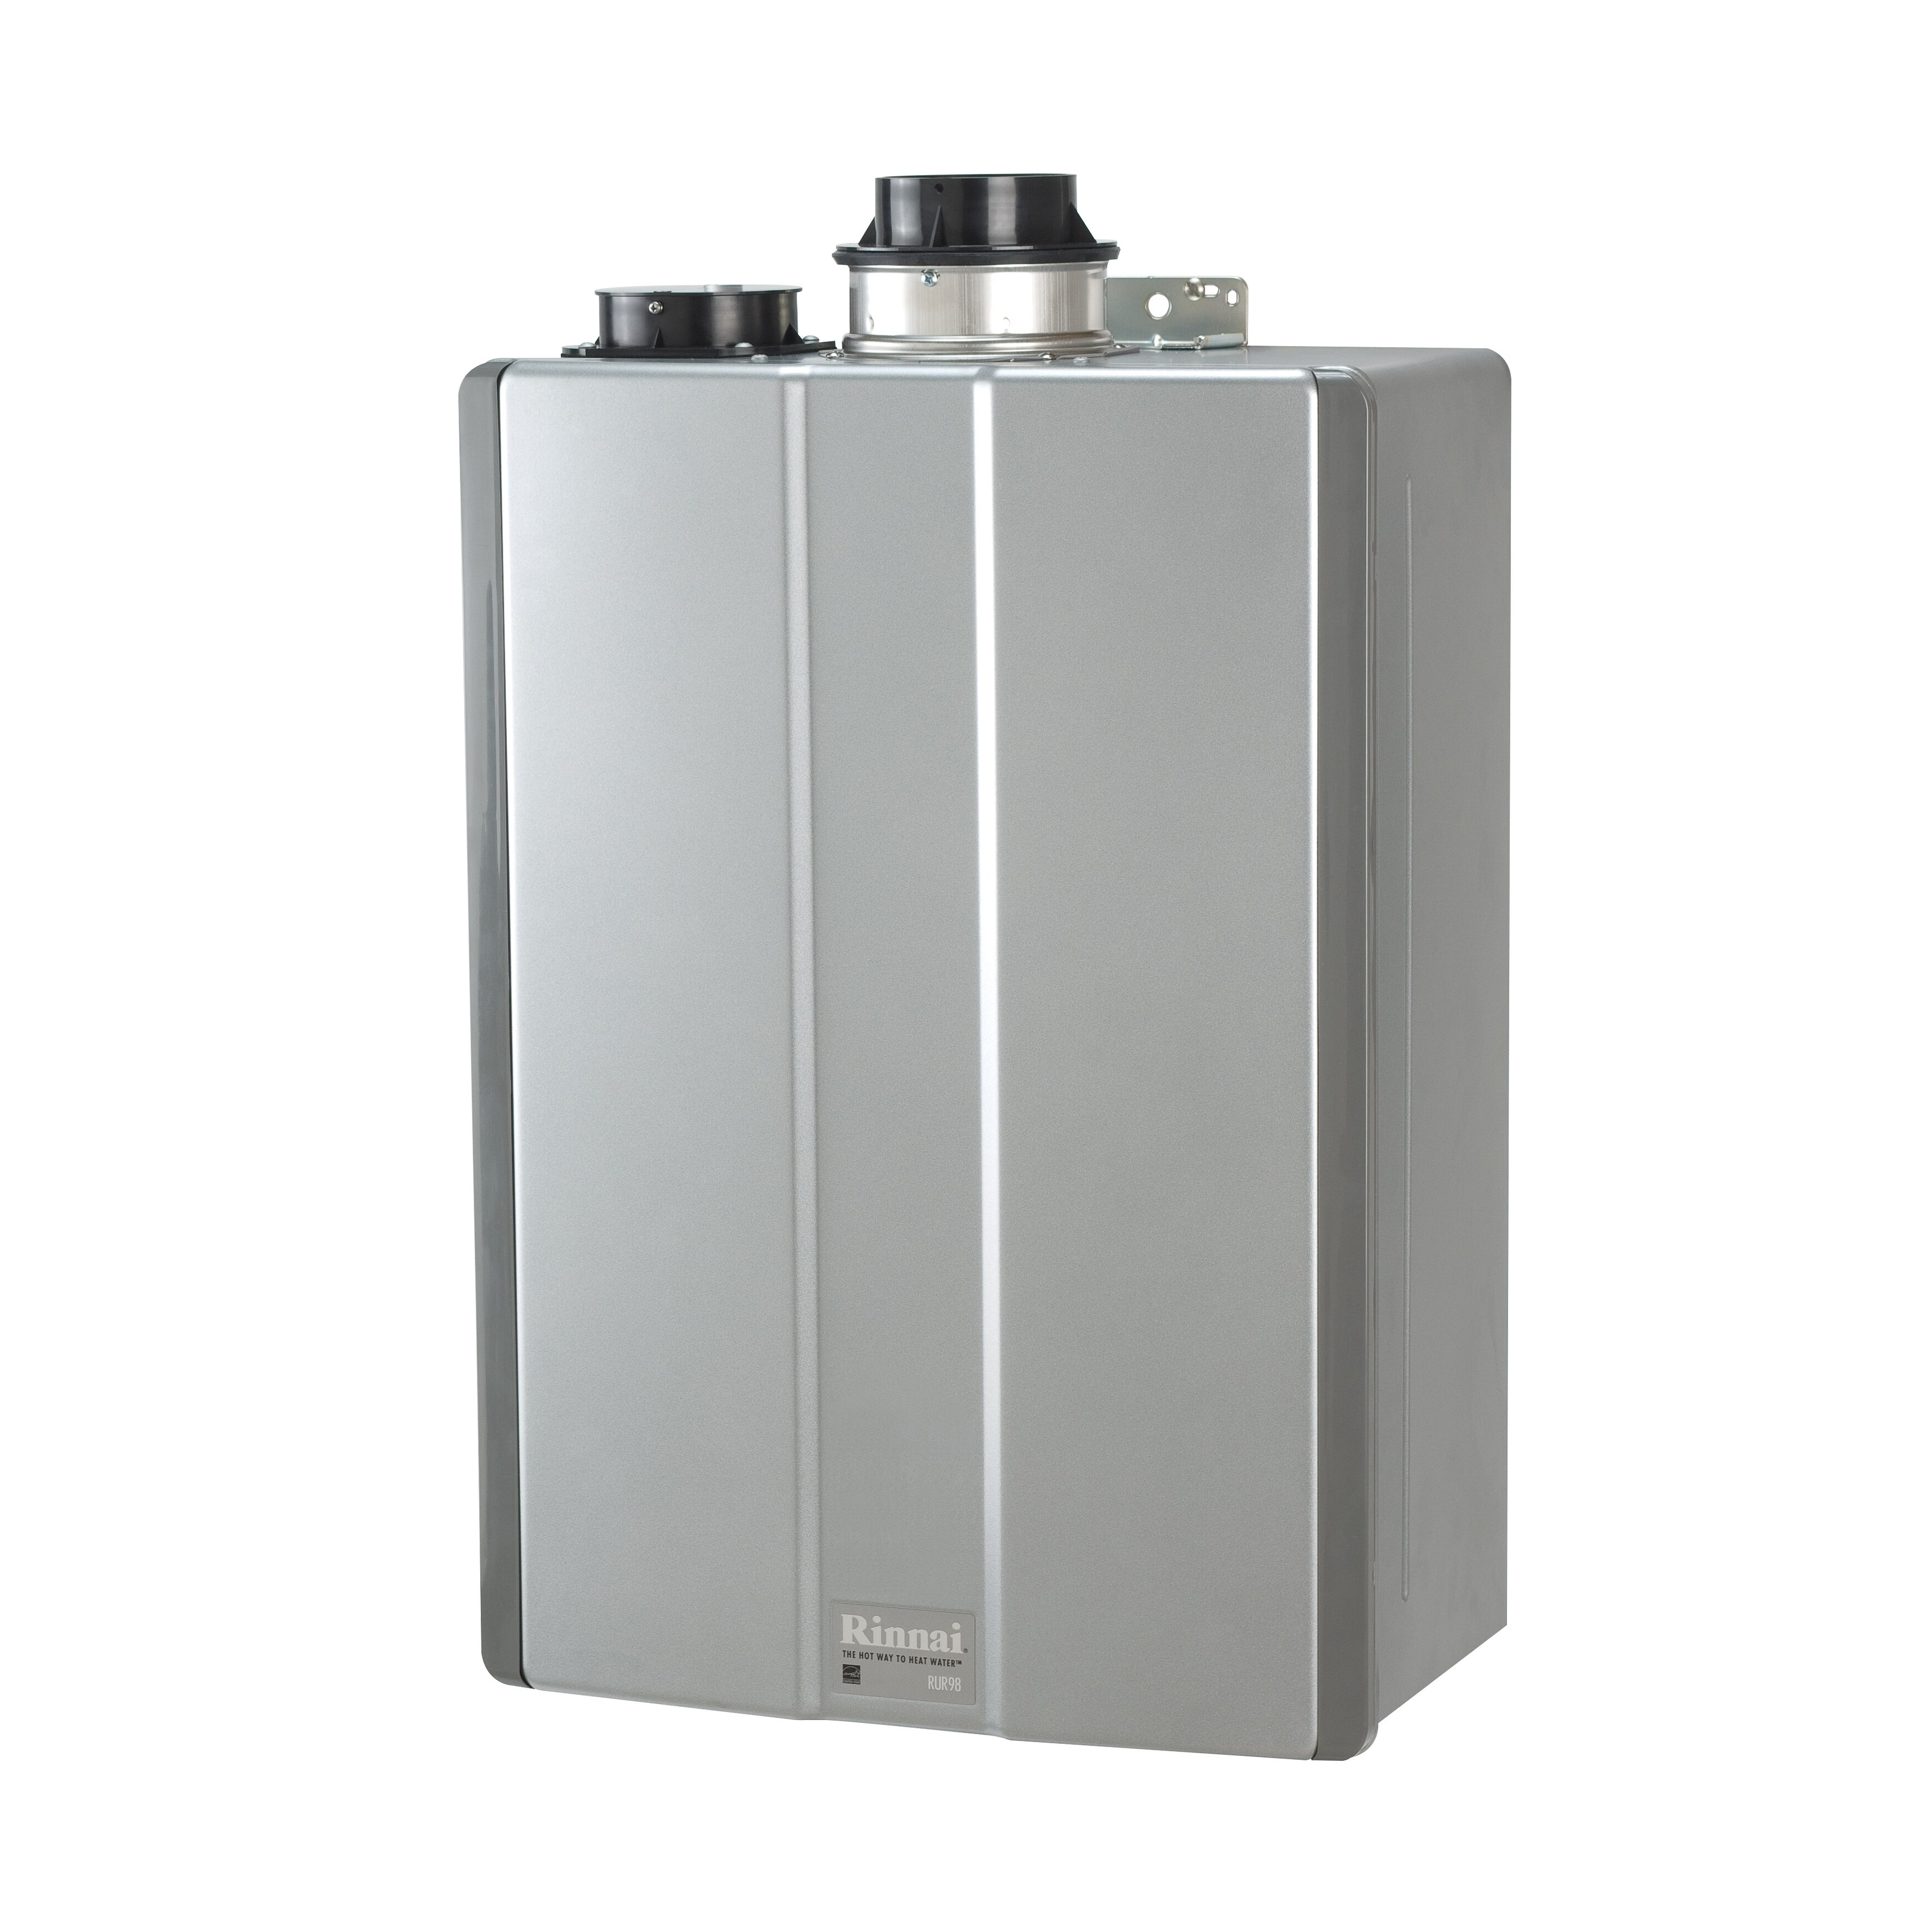 Rinnai Ultra Tankless Water Heater RUR98iP - Silver (Silv...